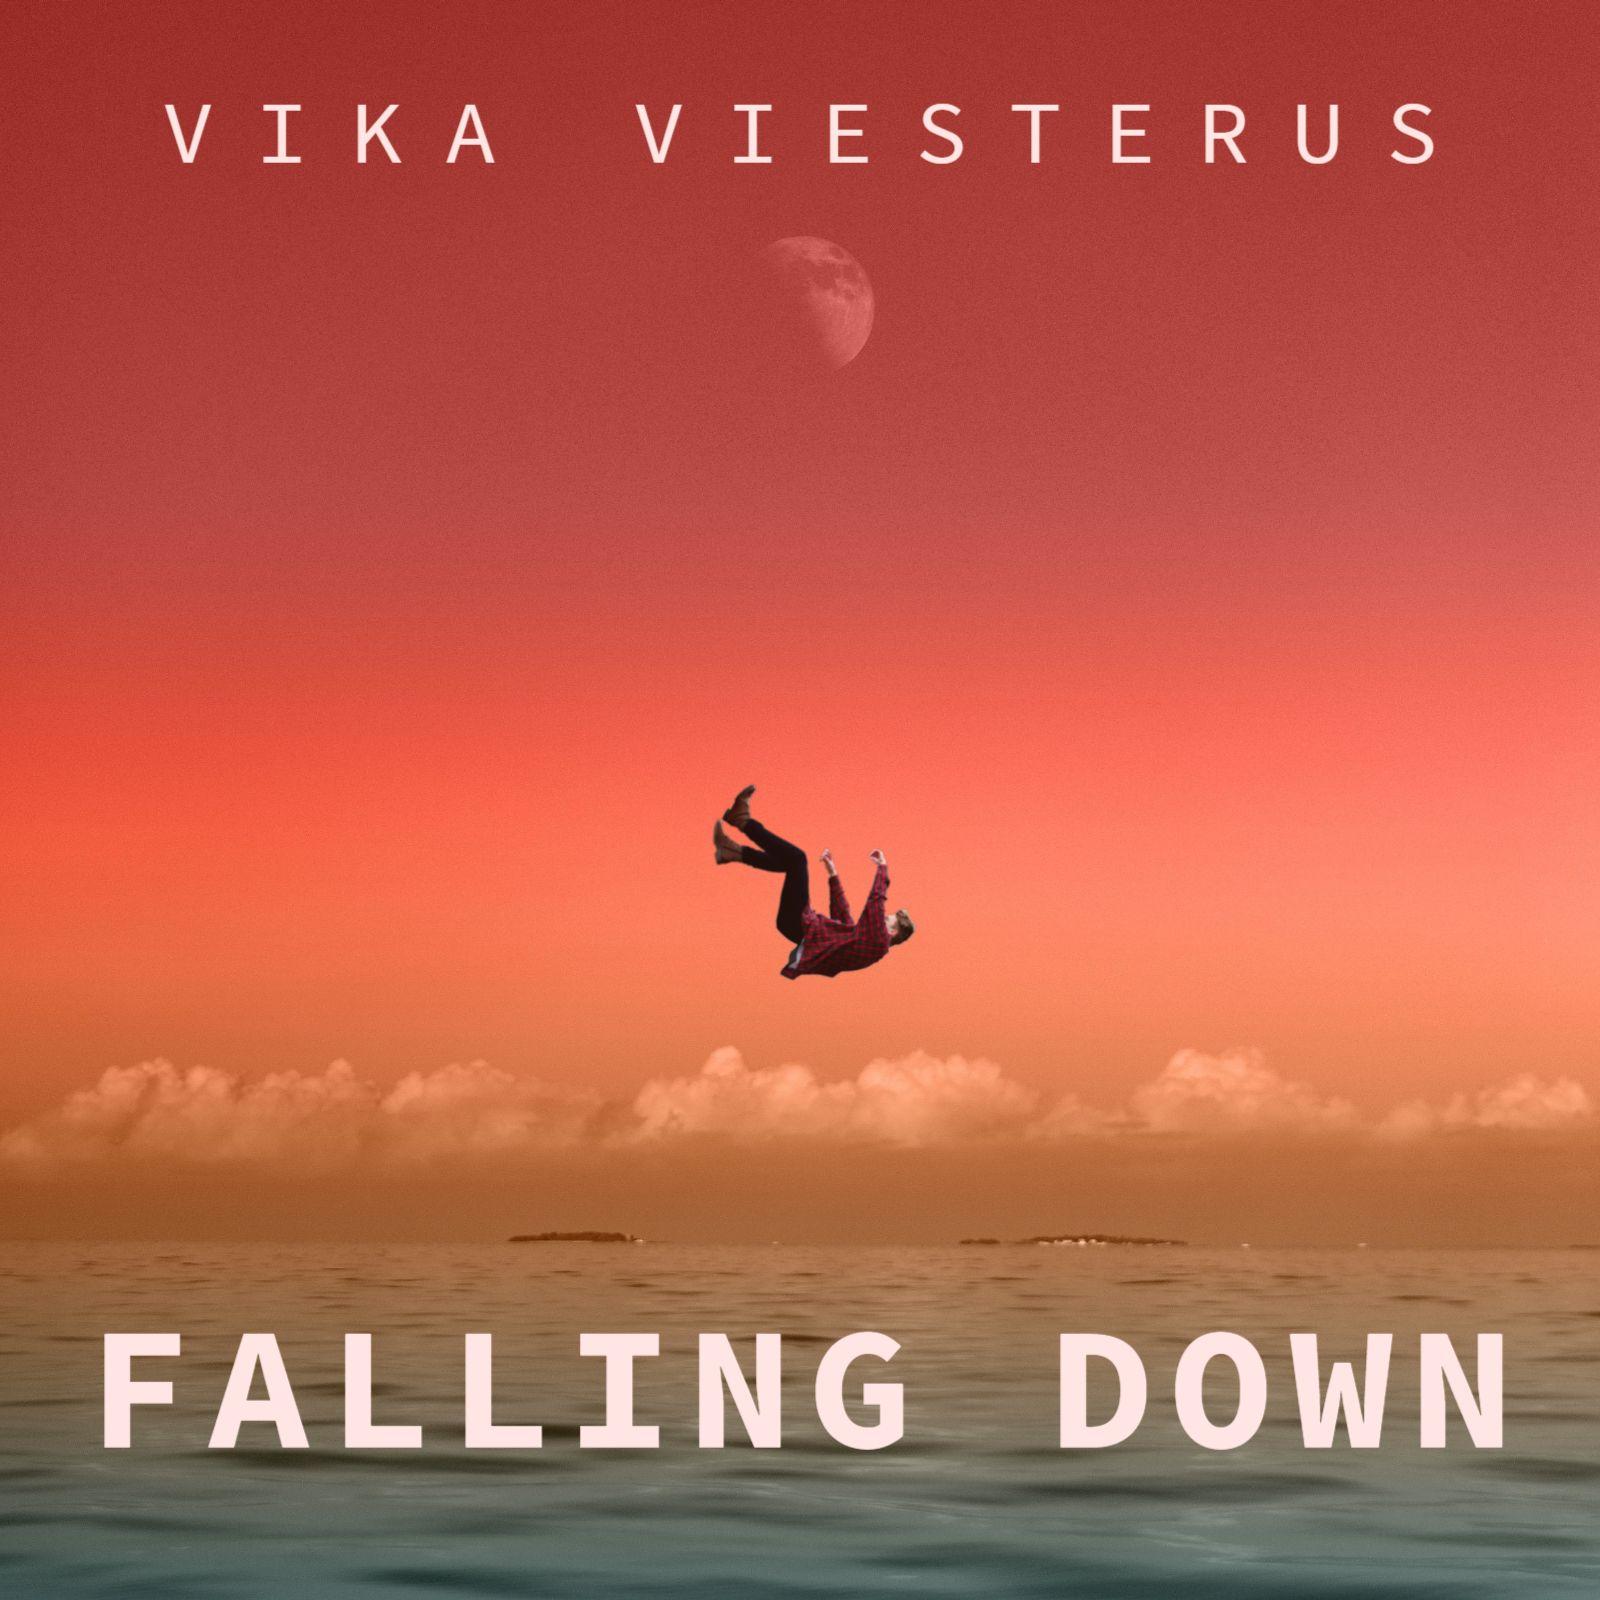 Falling Down Album Cover Template